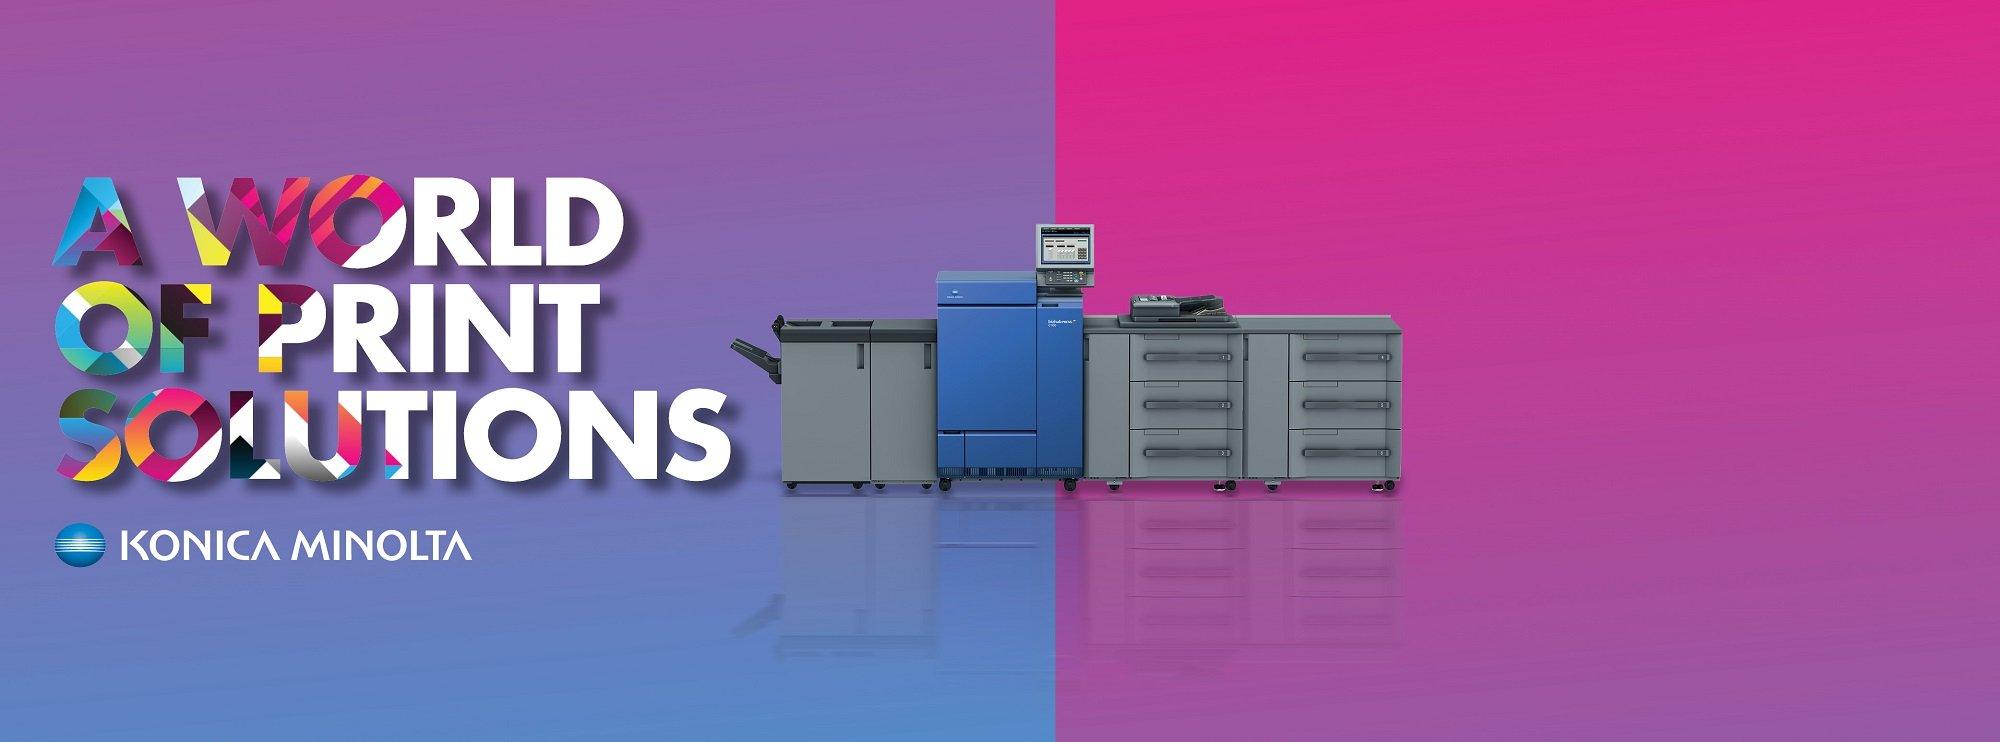 14 222 printers bunners 2000x7423 1 1, מדפסות לייזר צבע, מדפסות לייזר צבעוניות, מדפסת לייזר לעסק, מדפסות לייזר למשרד